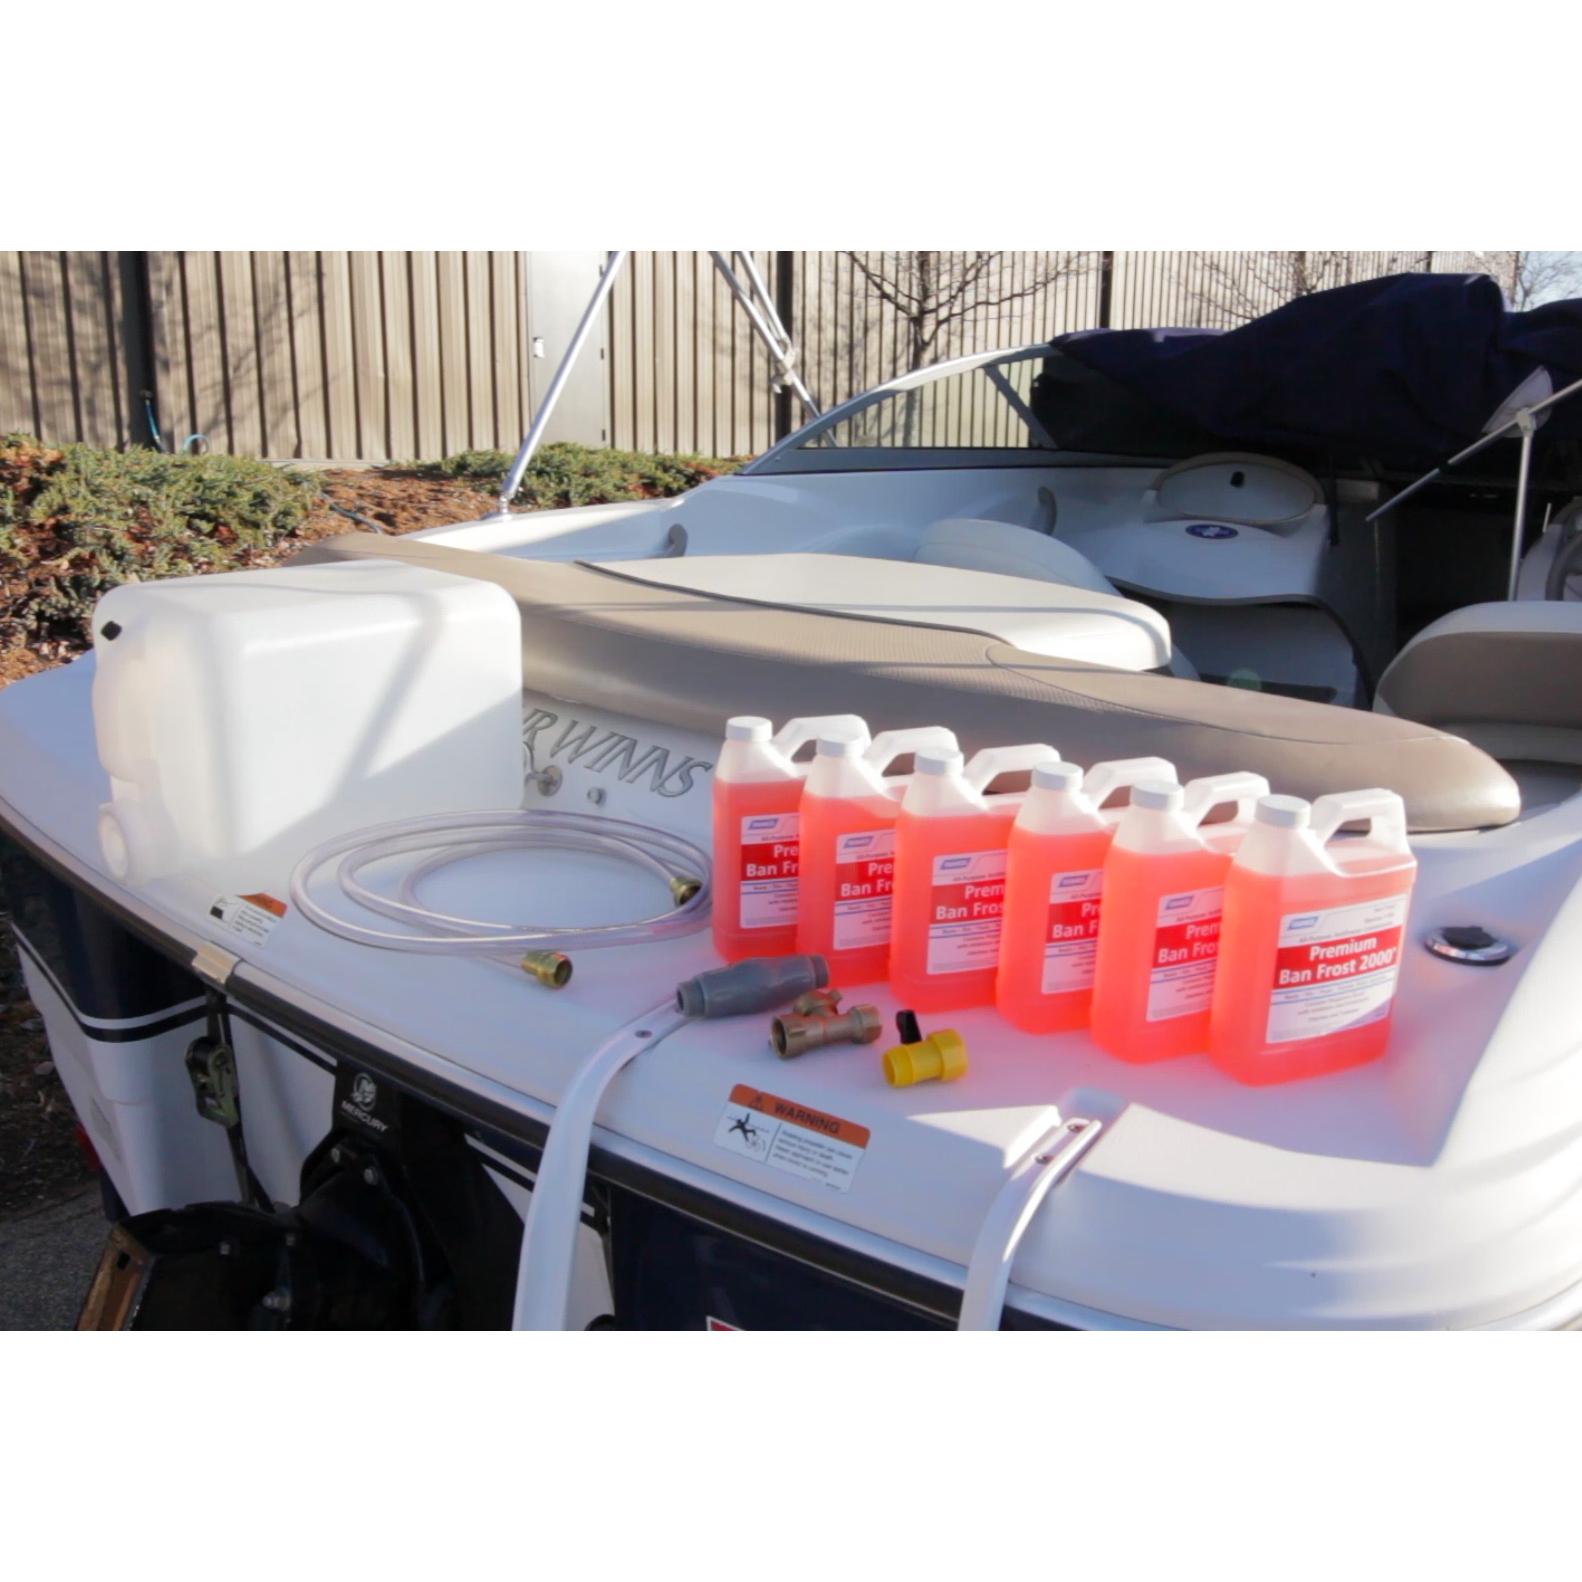 Do-It-Yourself Boat Winterizer Kit with Antifreeze